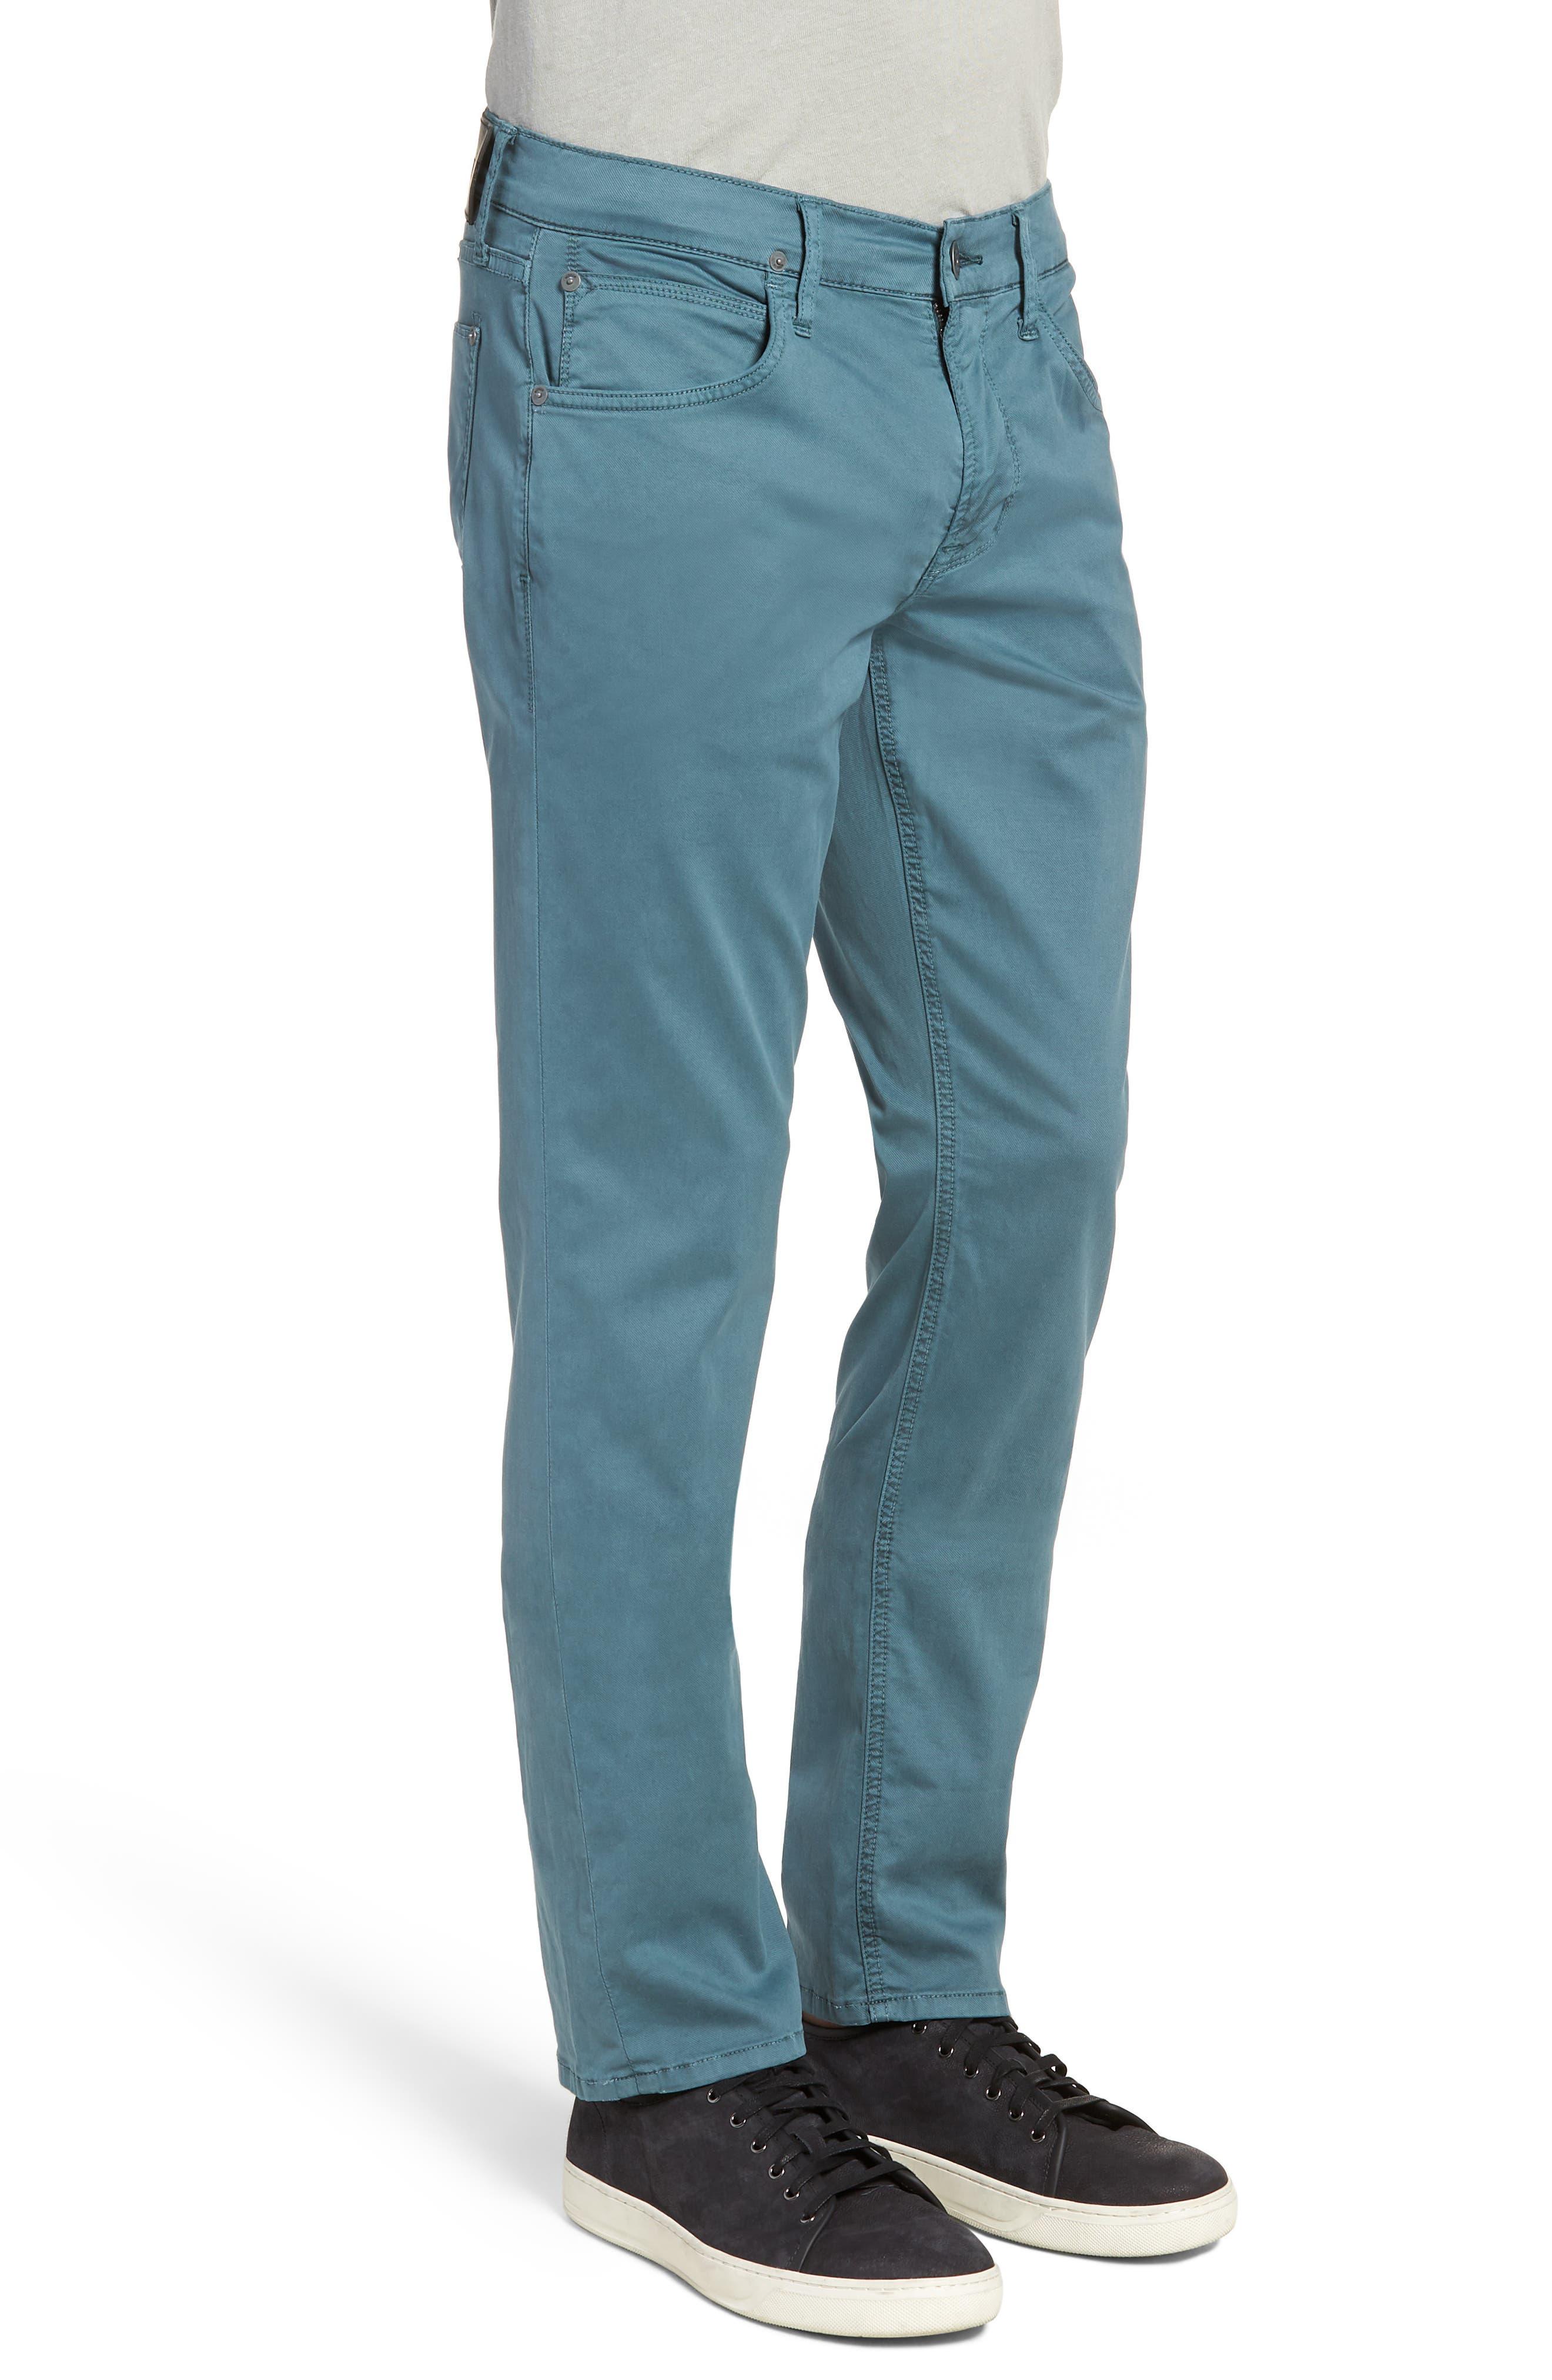 Blake Slim Fit Jeans,                             Alternate thumbnail 3, color,                             Ocean